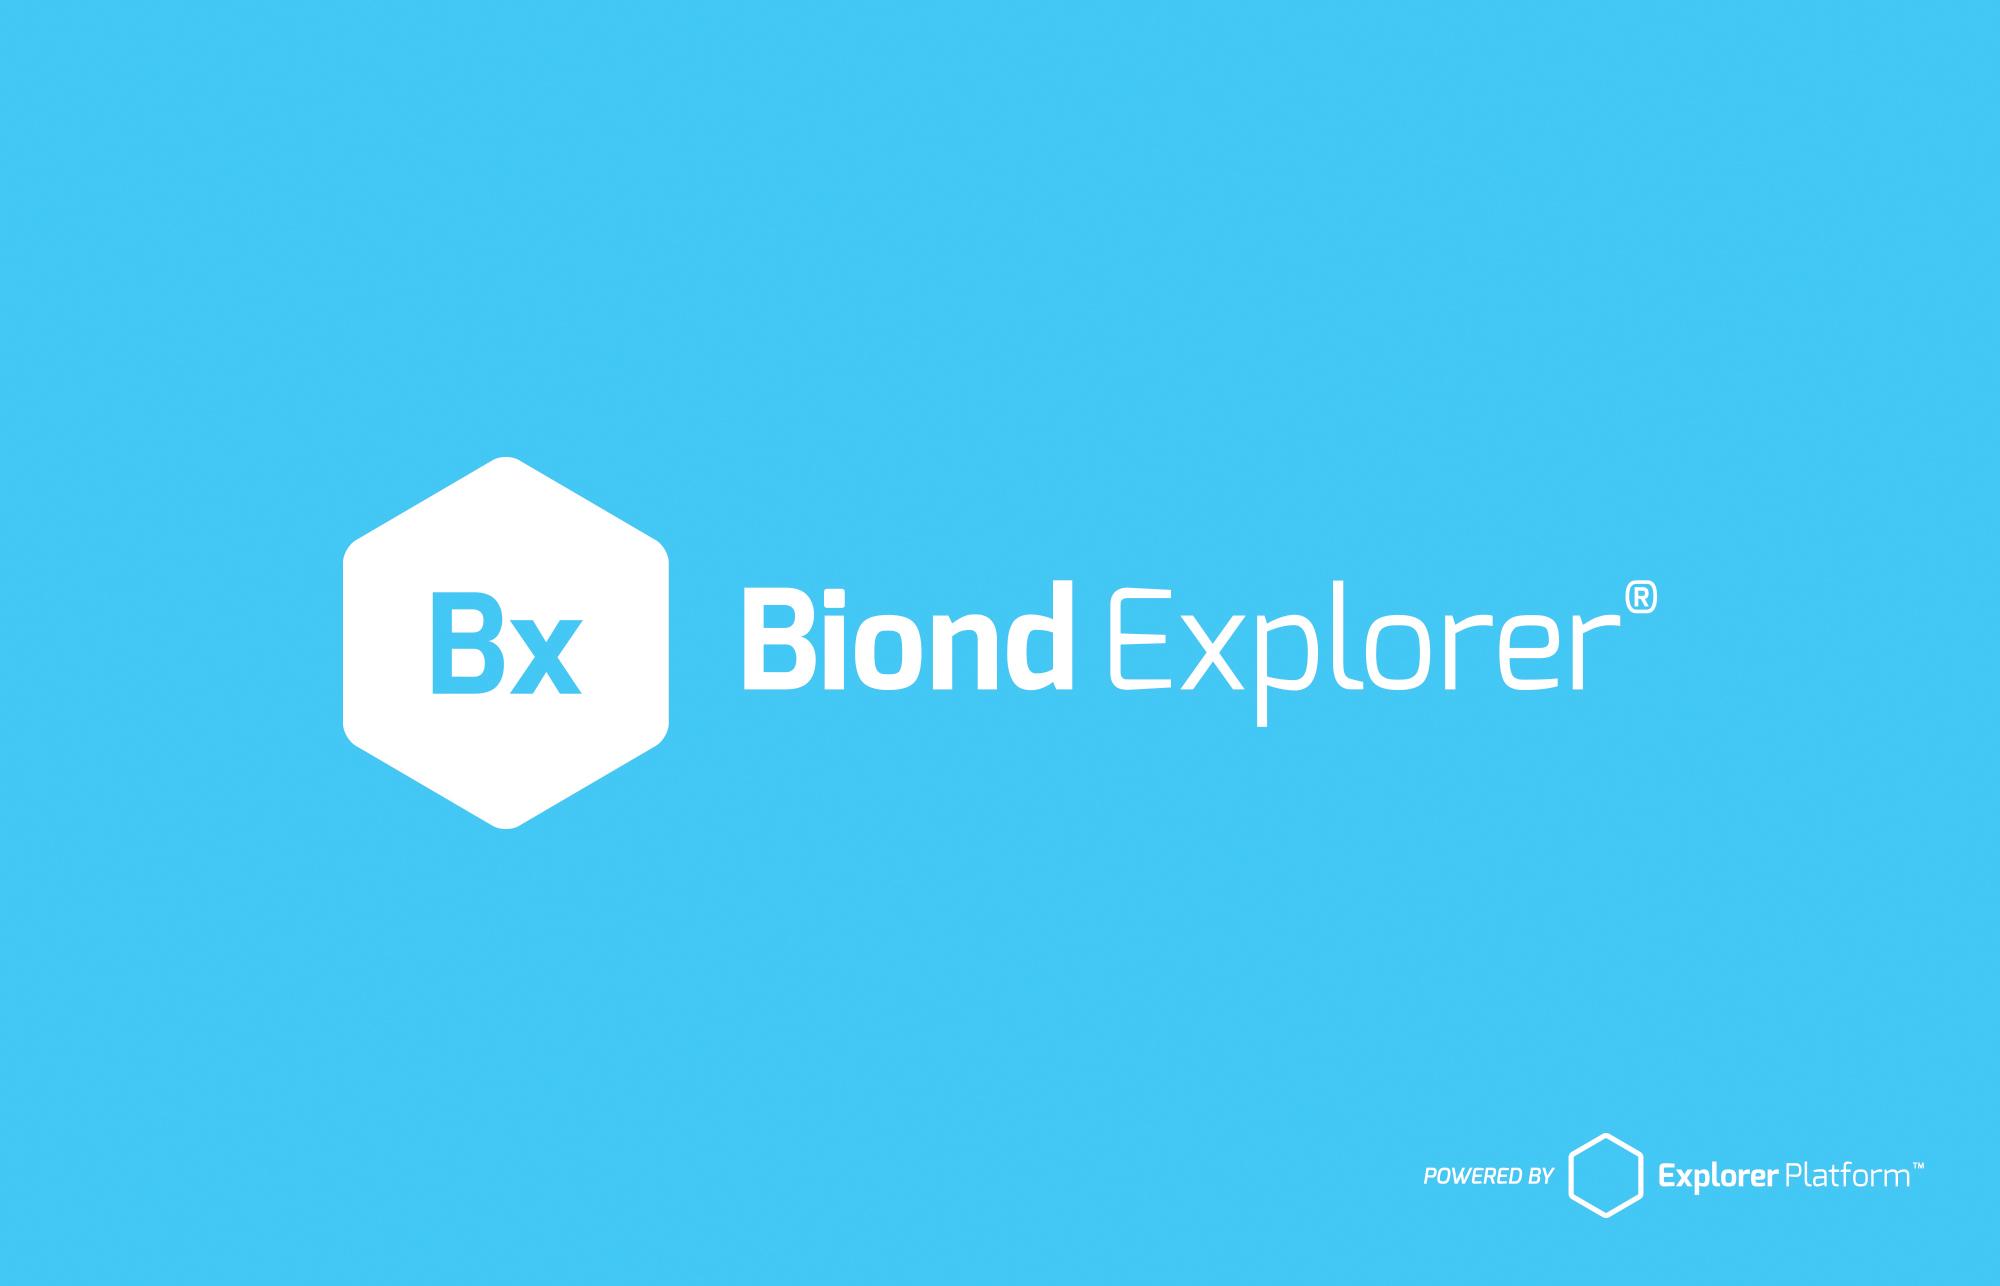 biond_explorer_logo